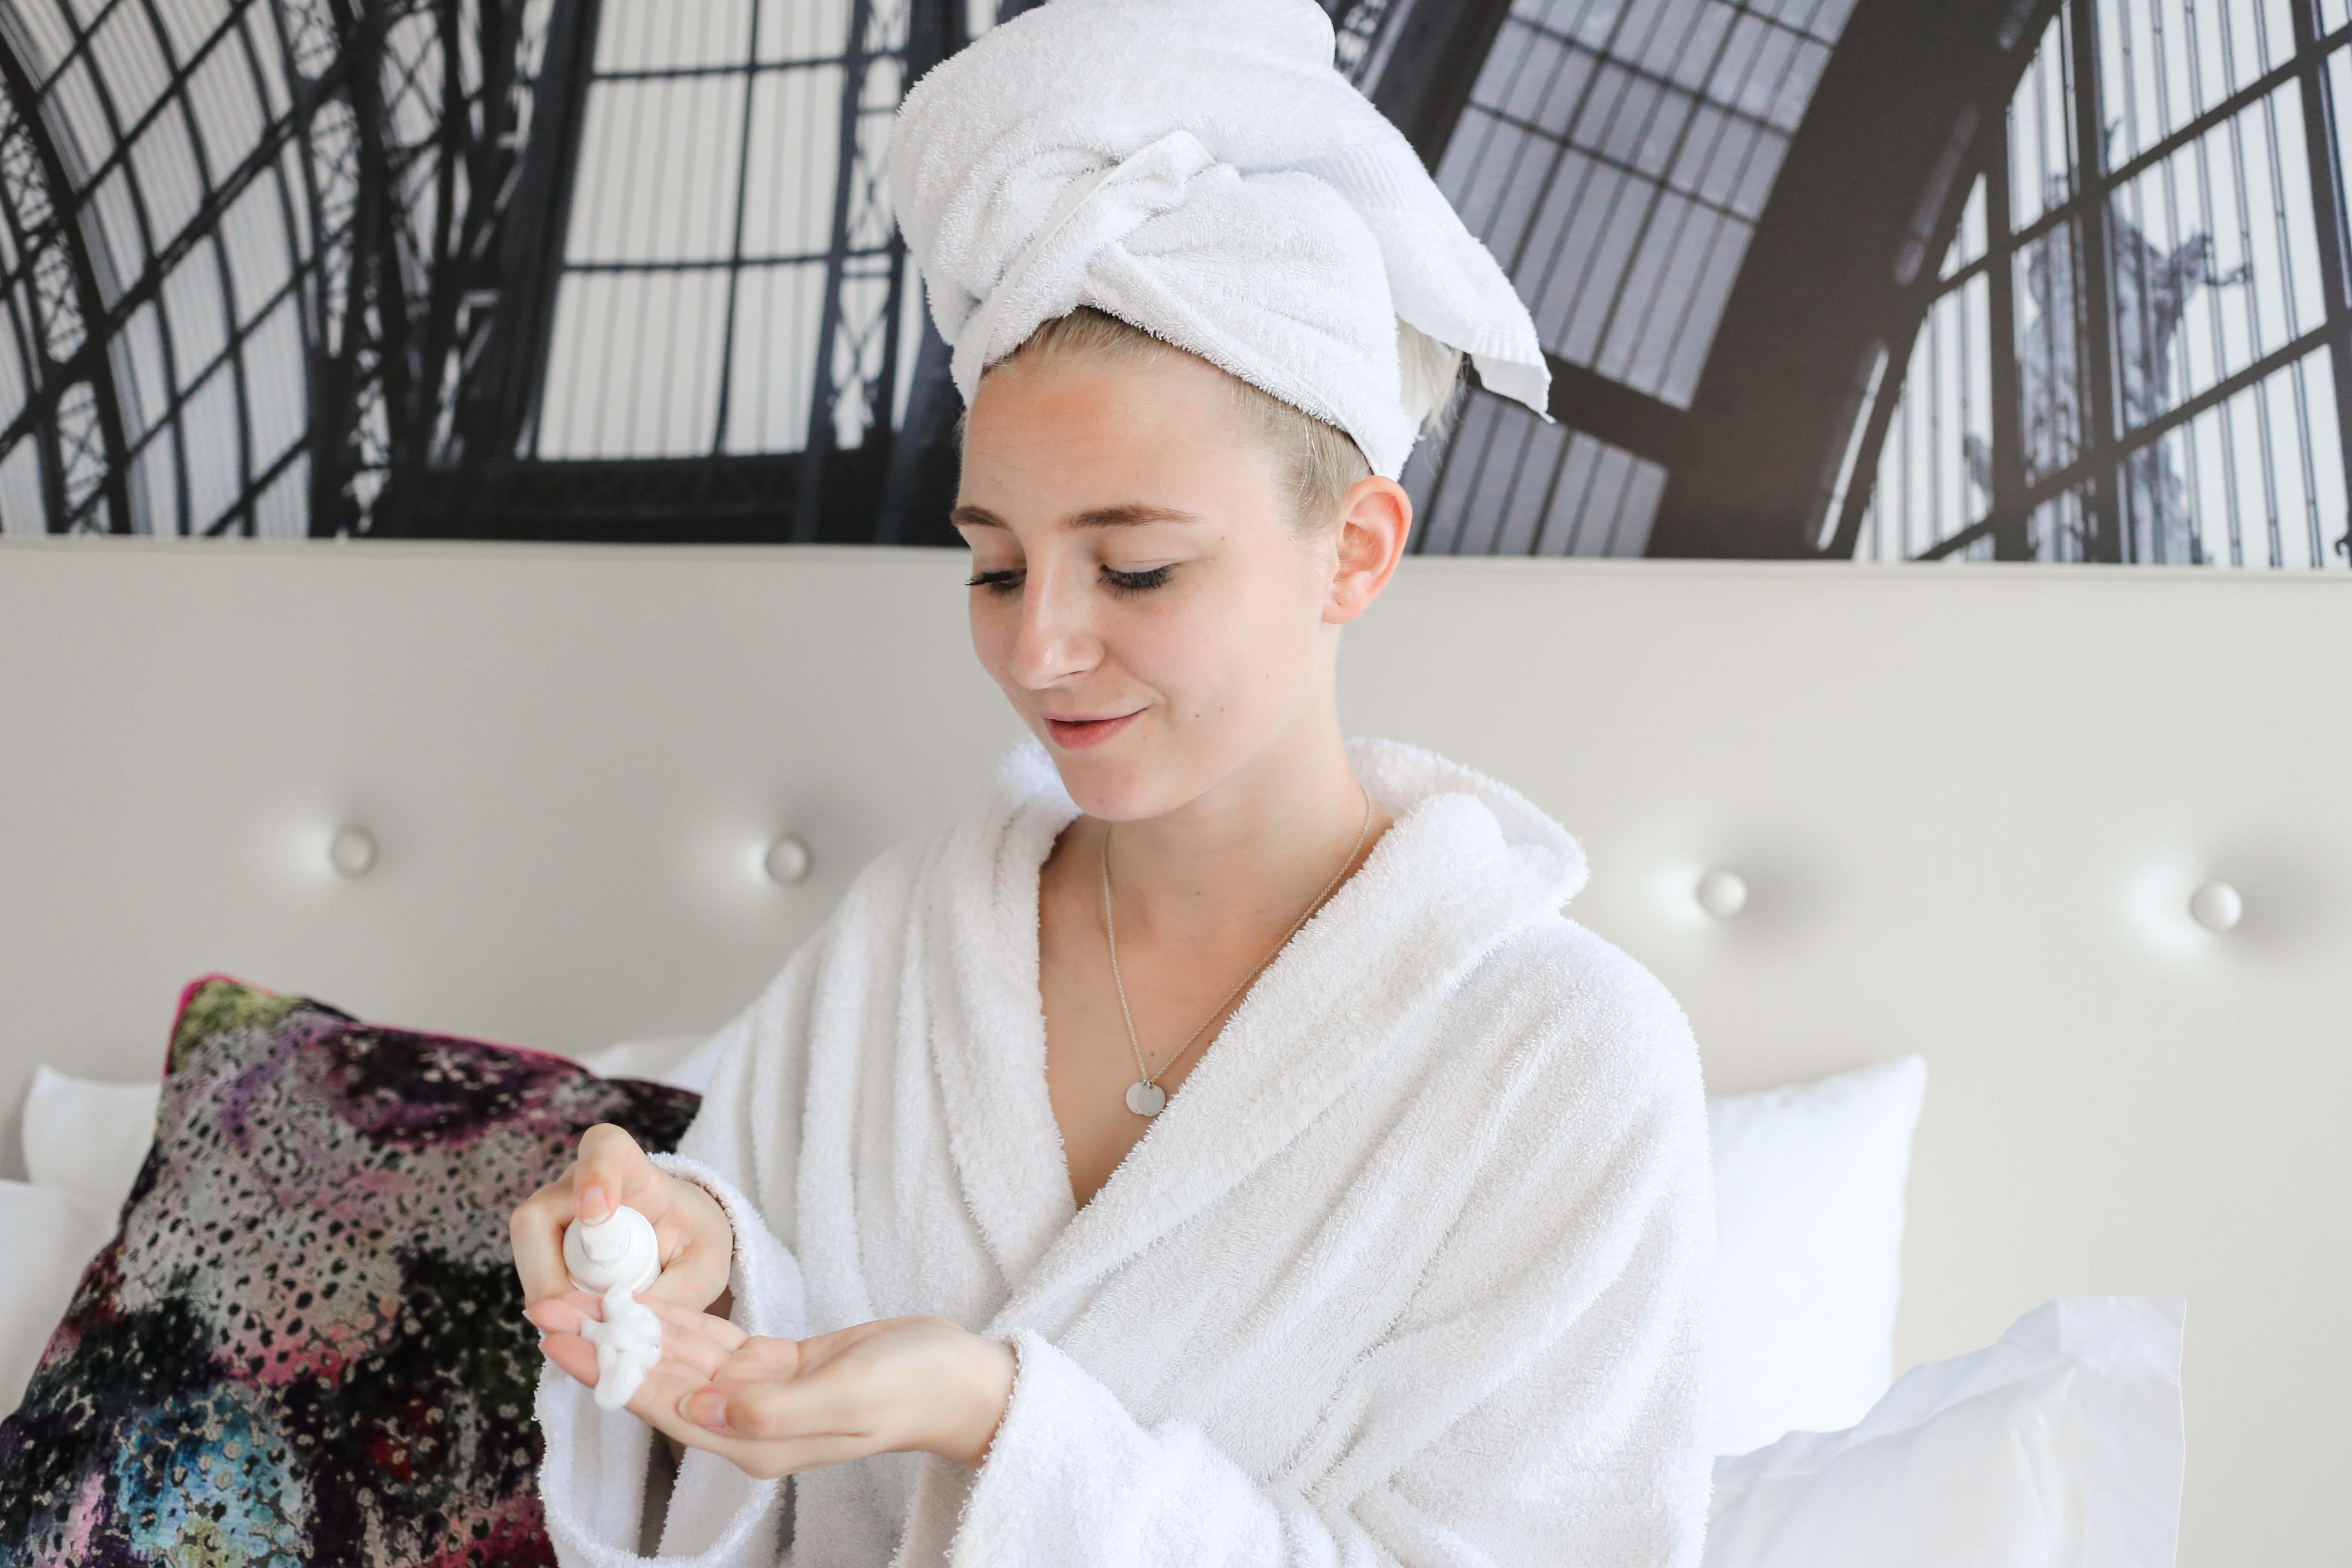 sommerhautpflege-urlaub-dermasence-beauty-kosmetik-hautpflege-beautyblogger_1155